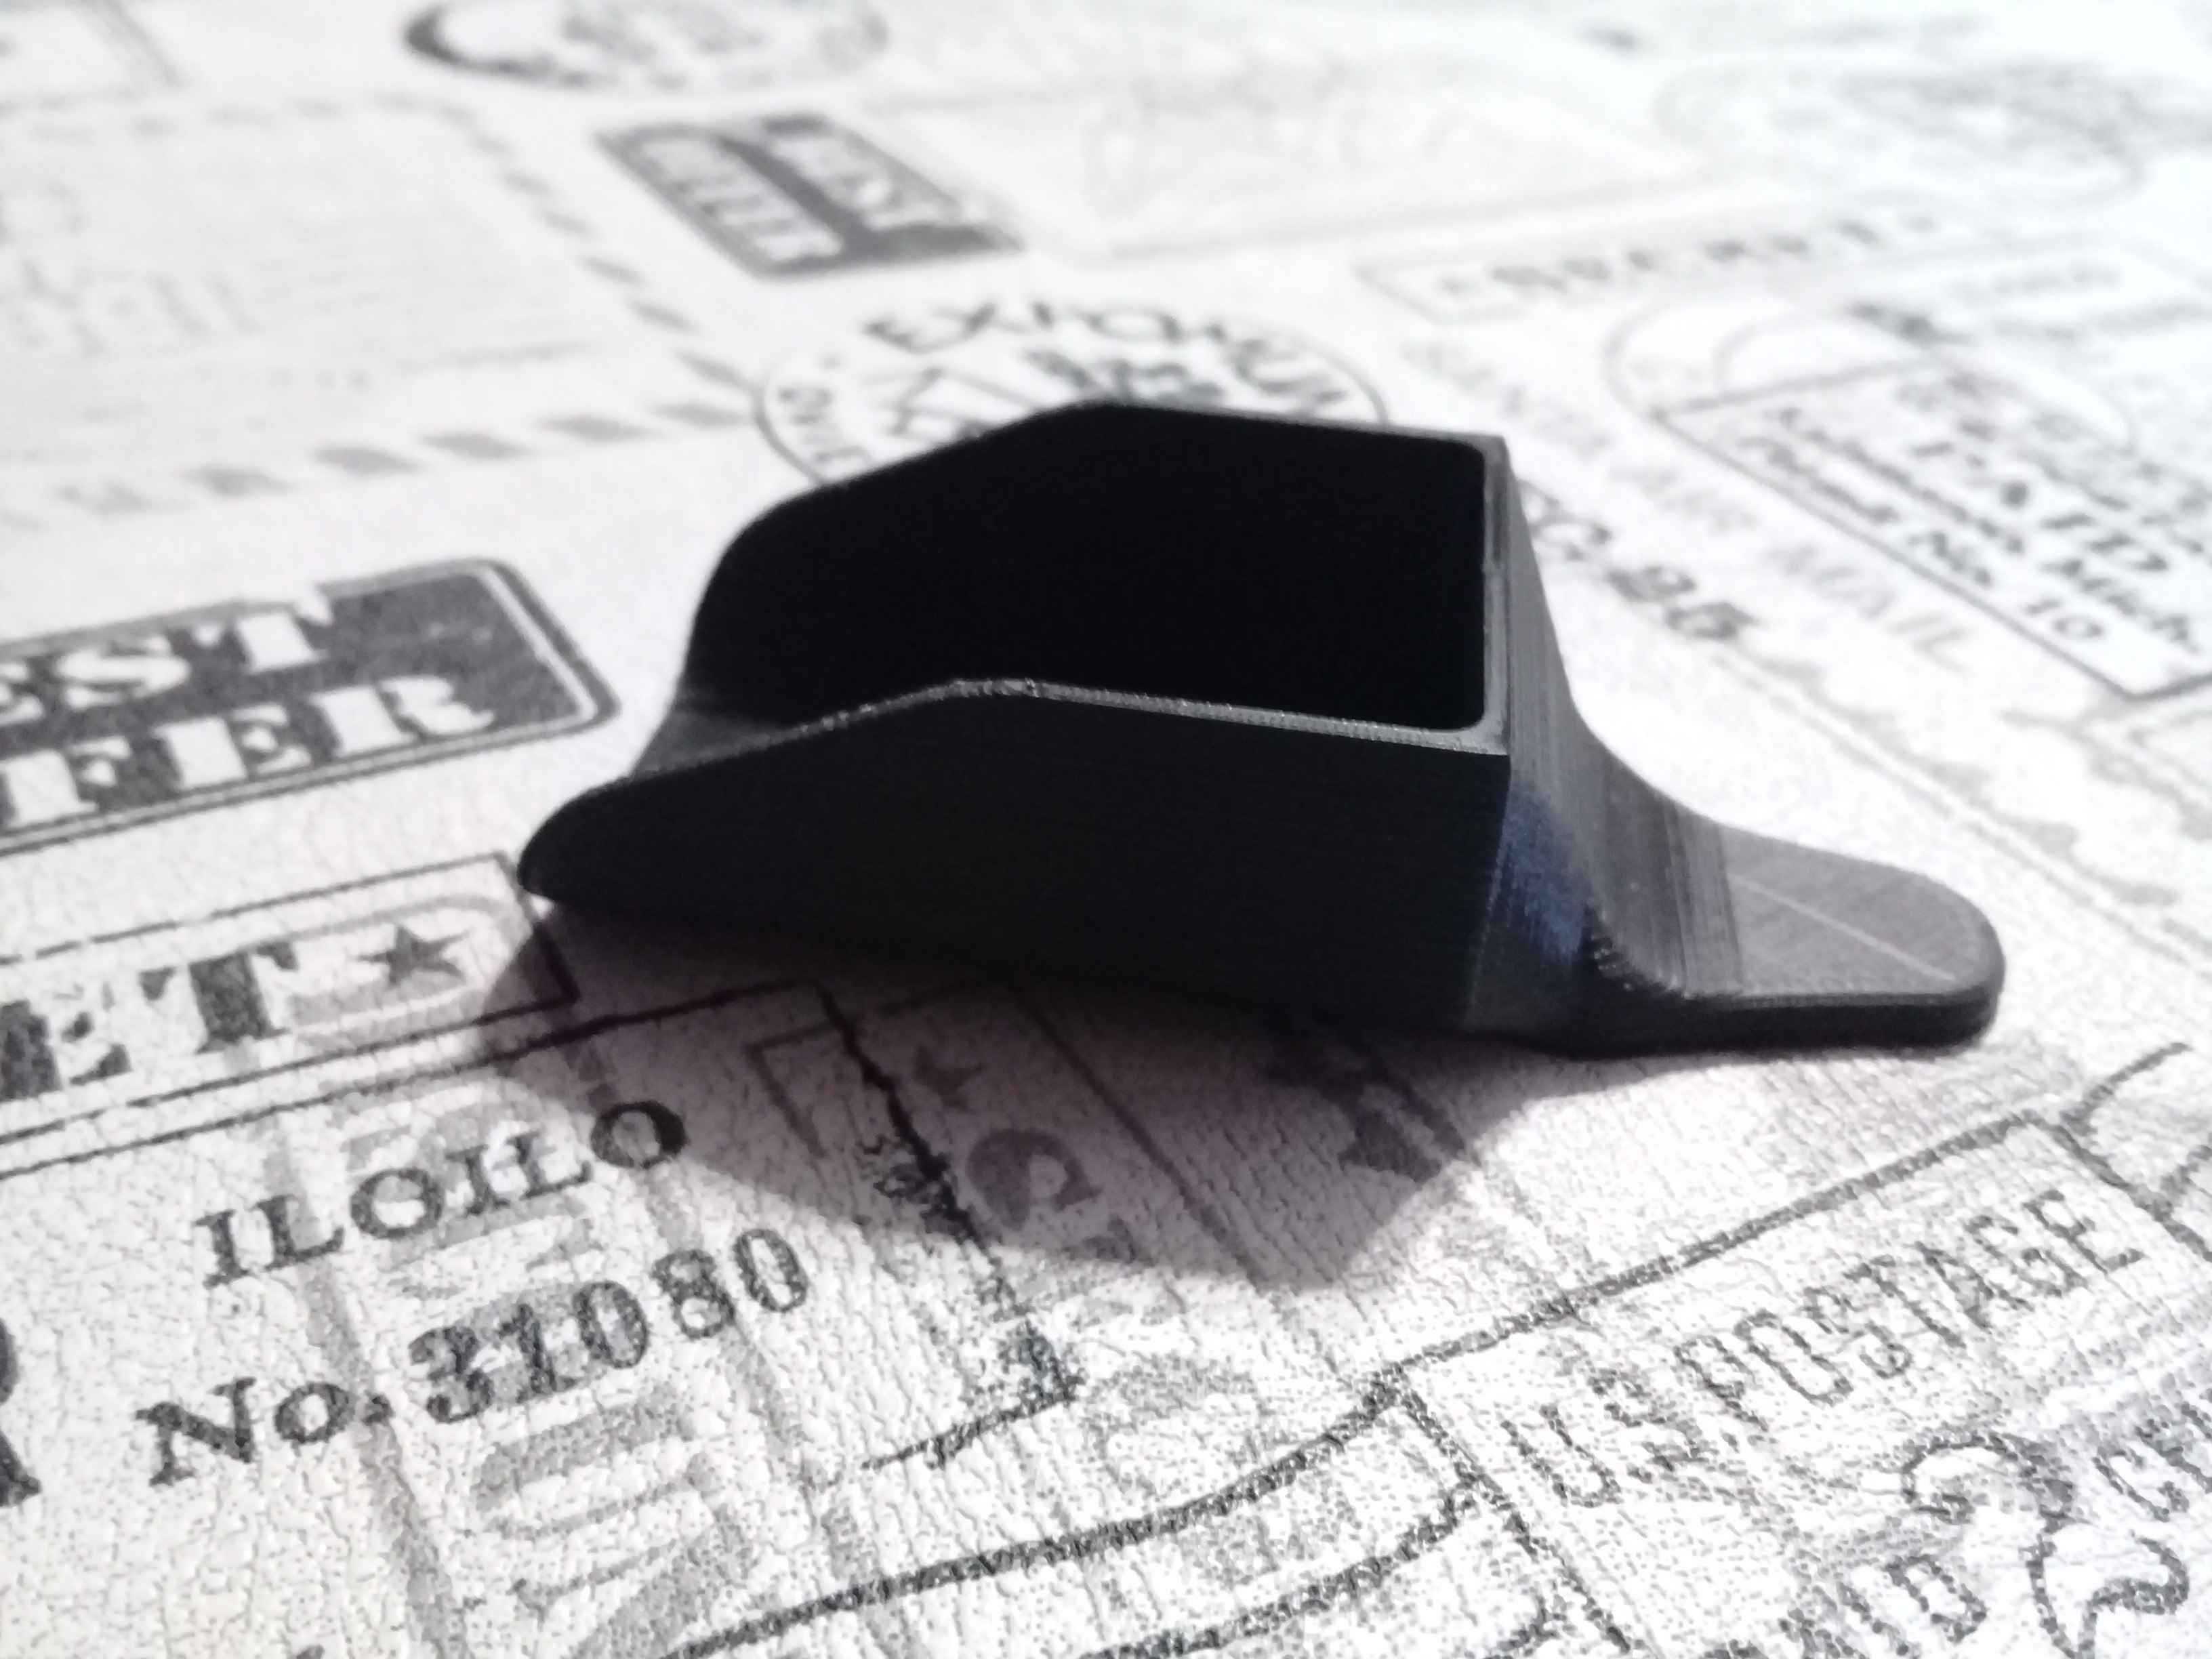 20180815_181323.jpg Download STL file Spoon • 3D printing design, damia05